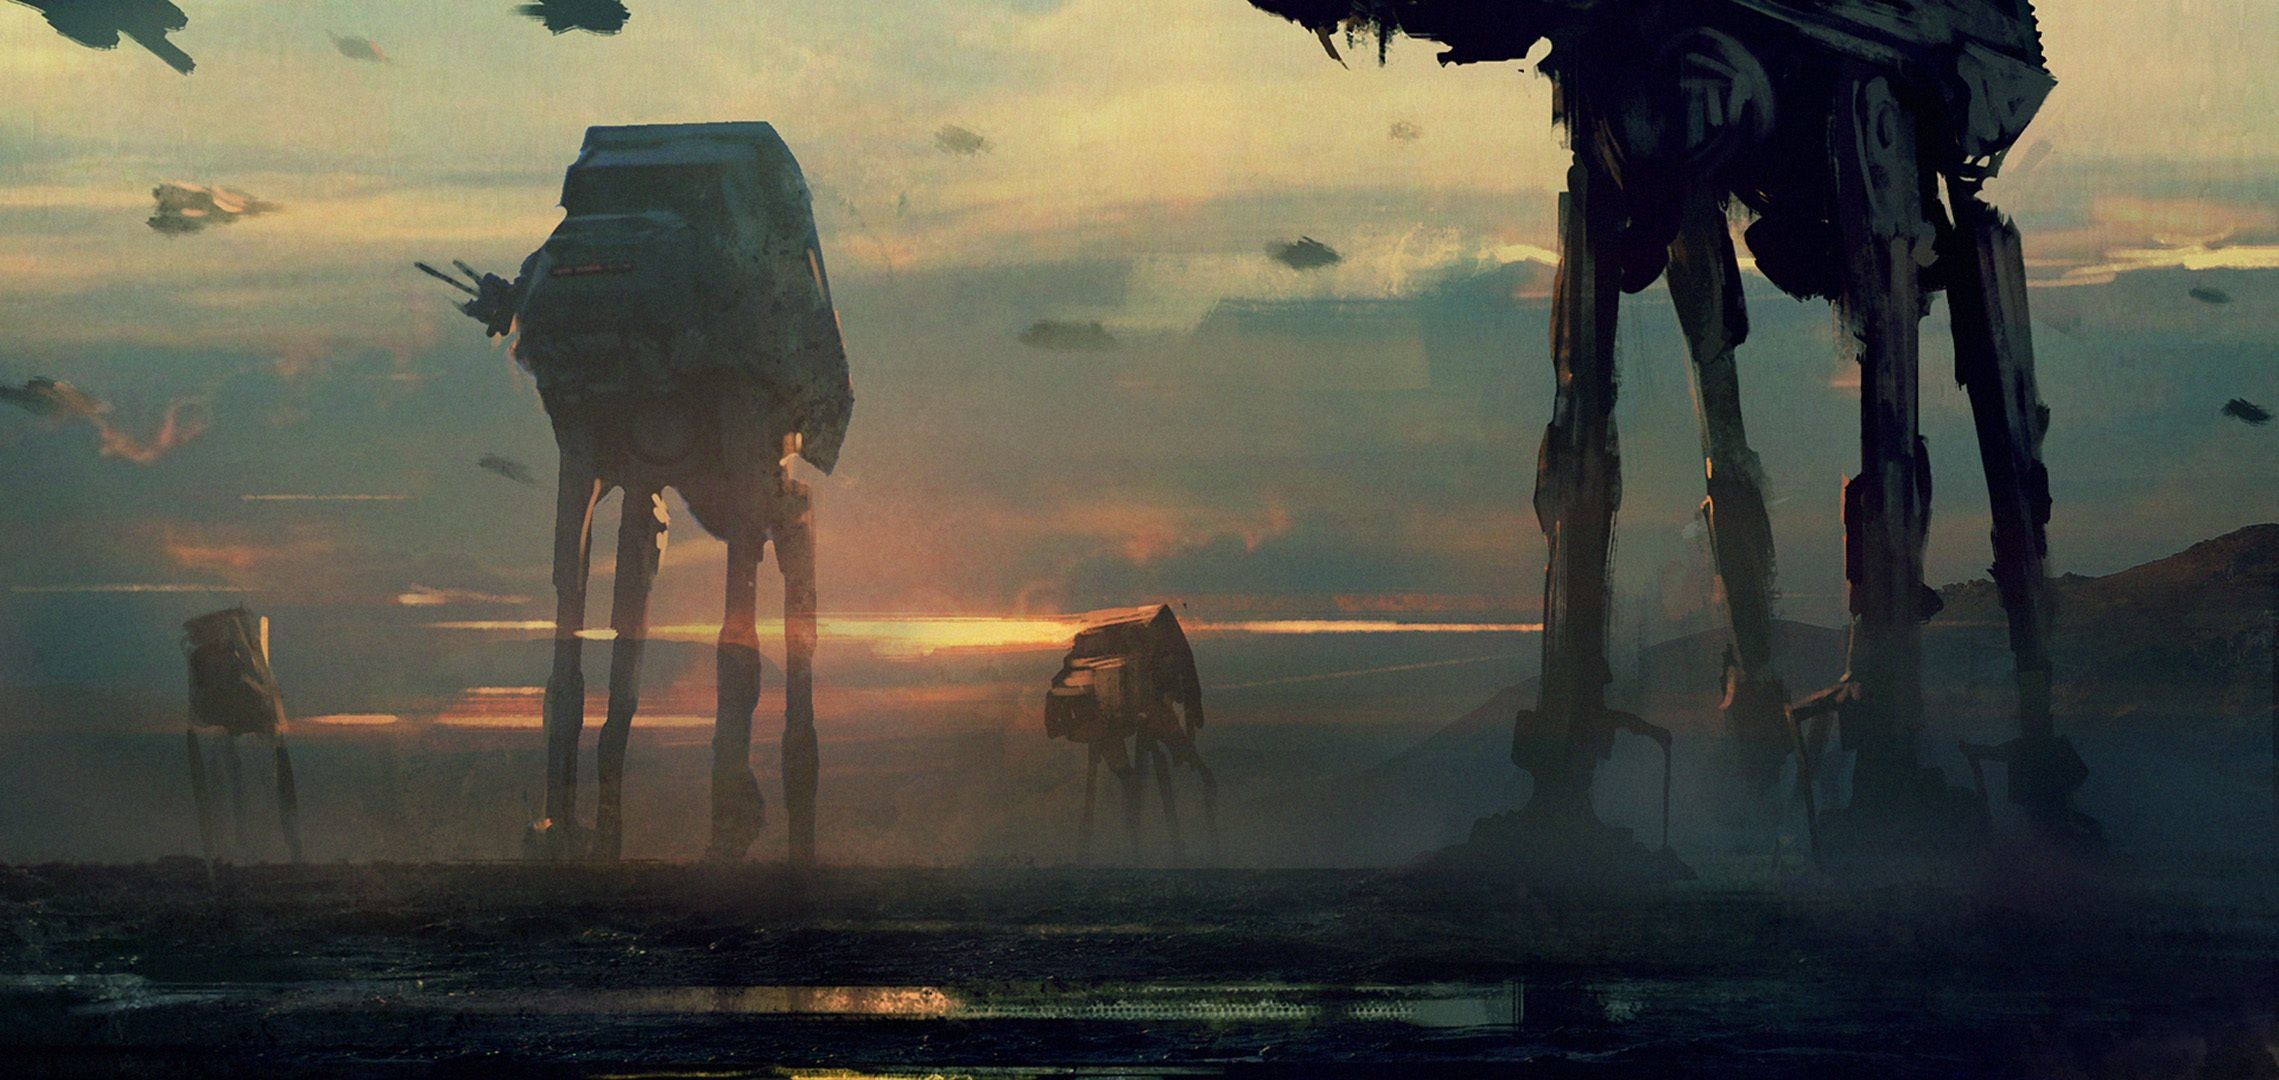 Download wallpaper imperial walkers, star wars, art, robots, films .